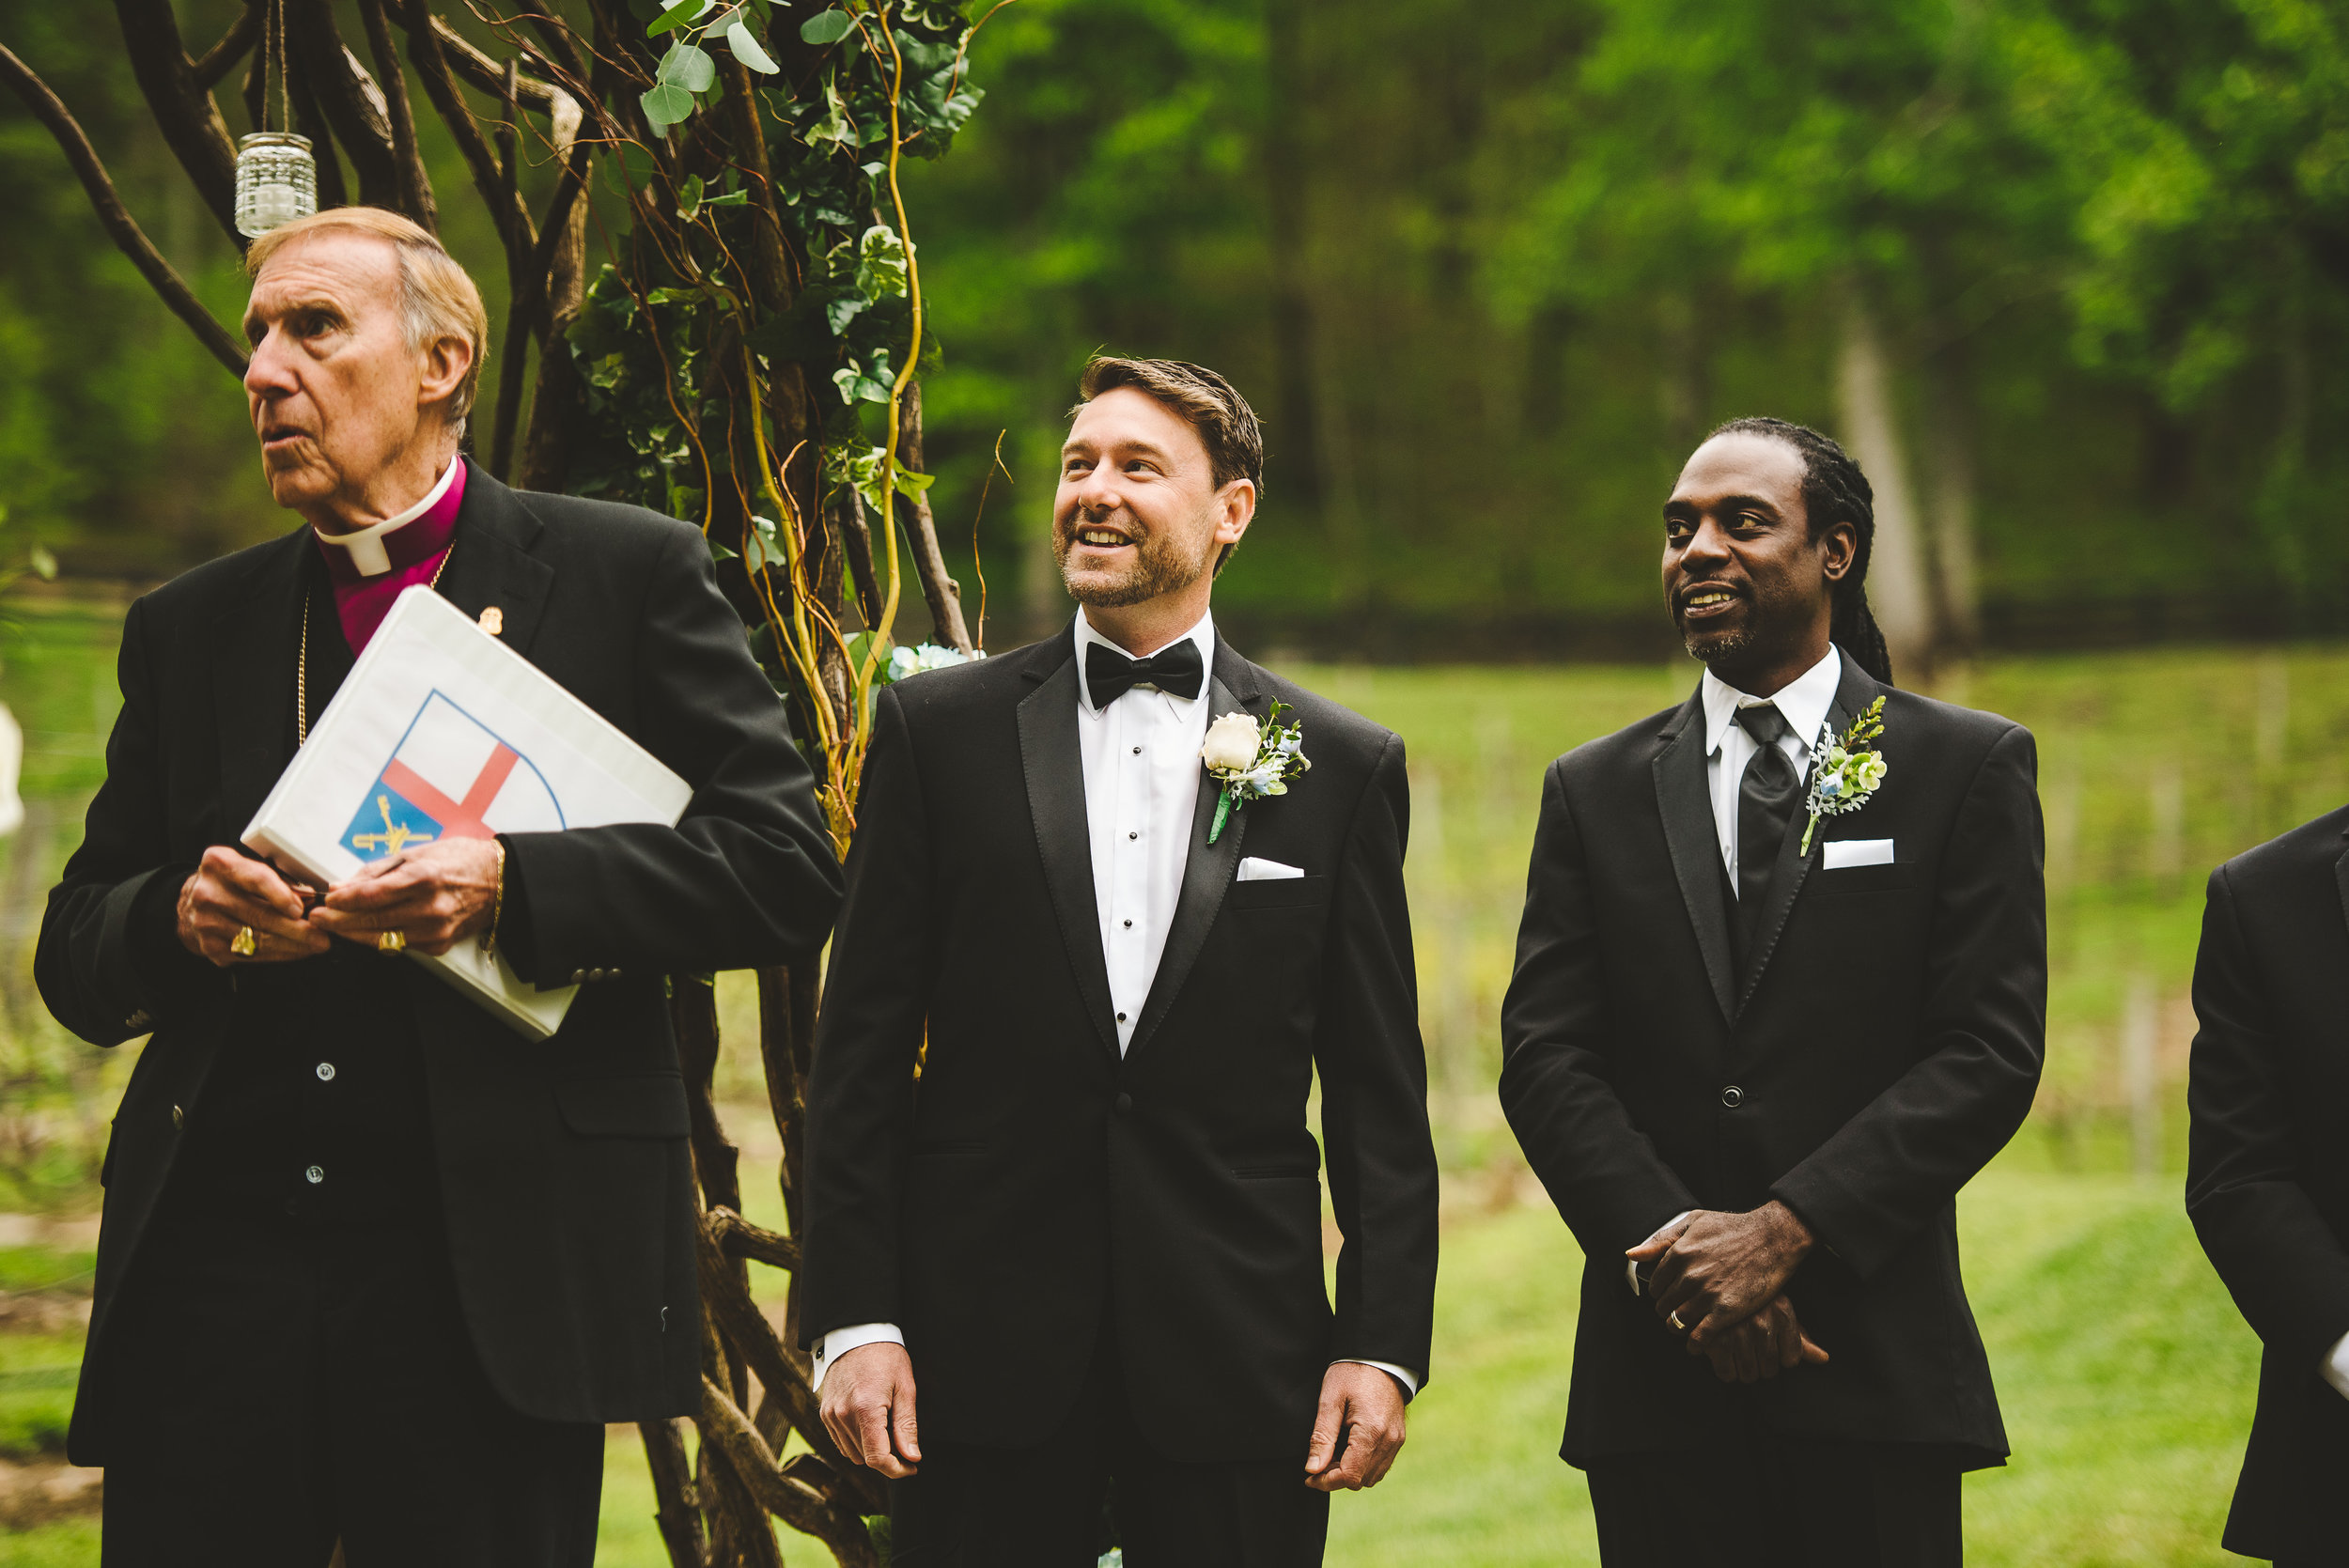 giovanna-richard-wedding-139.jpg